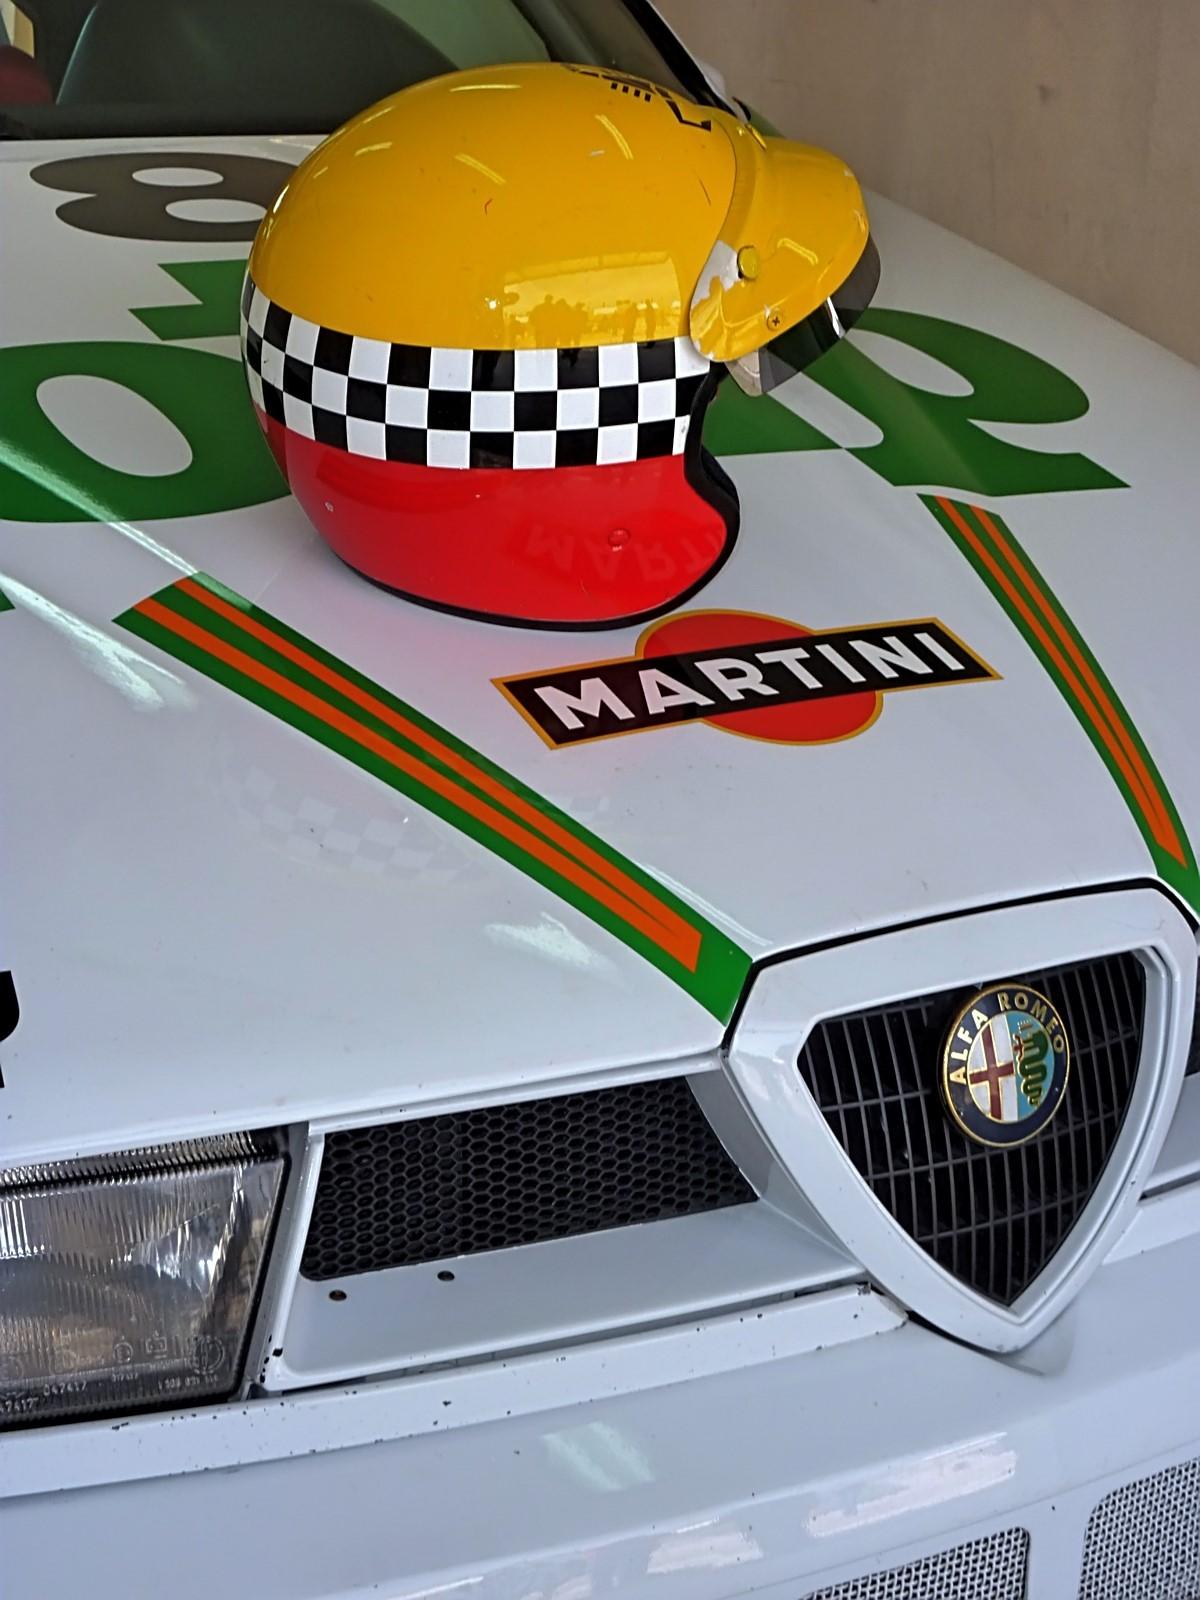 1992 Alfa Romeo 155 GTA S1 (49)